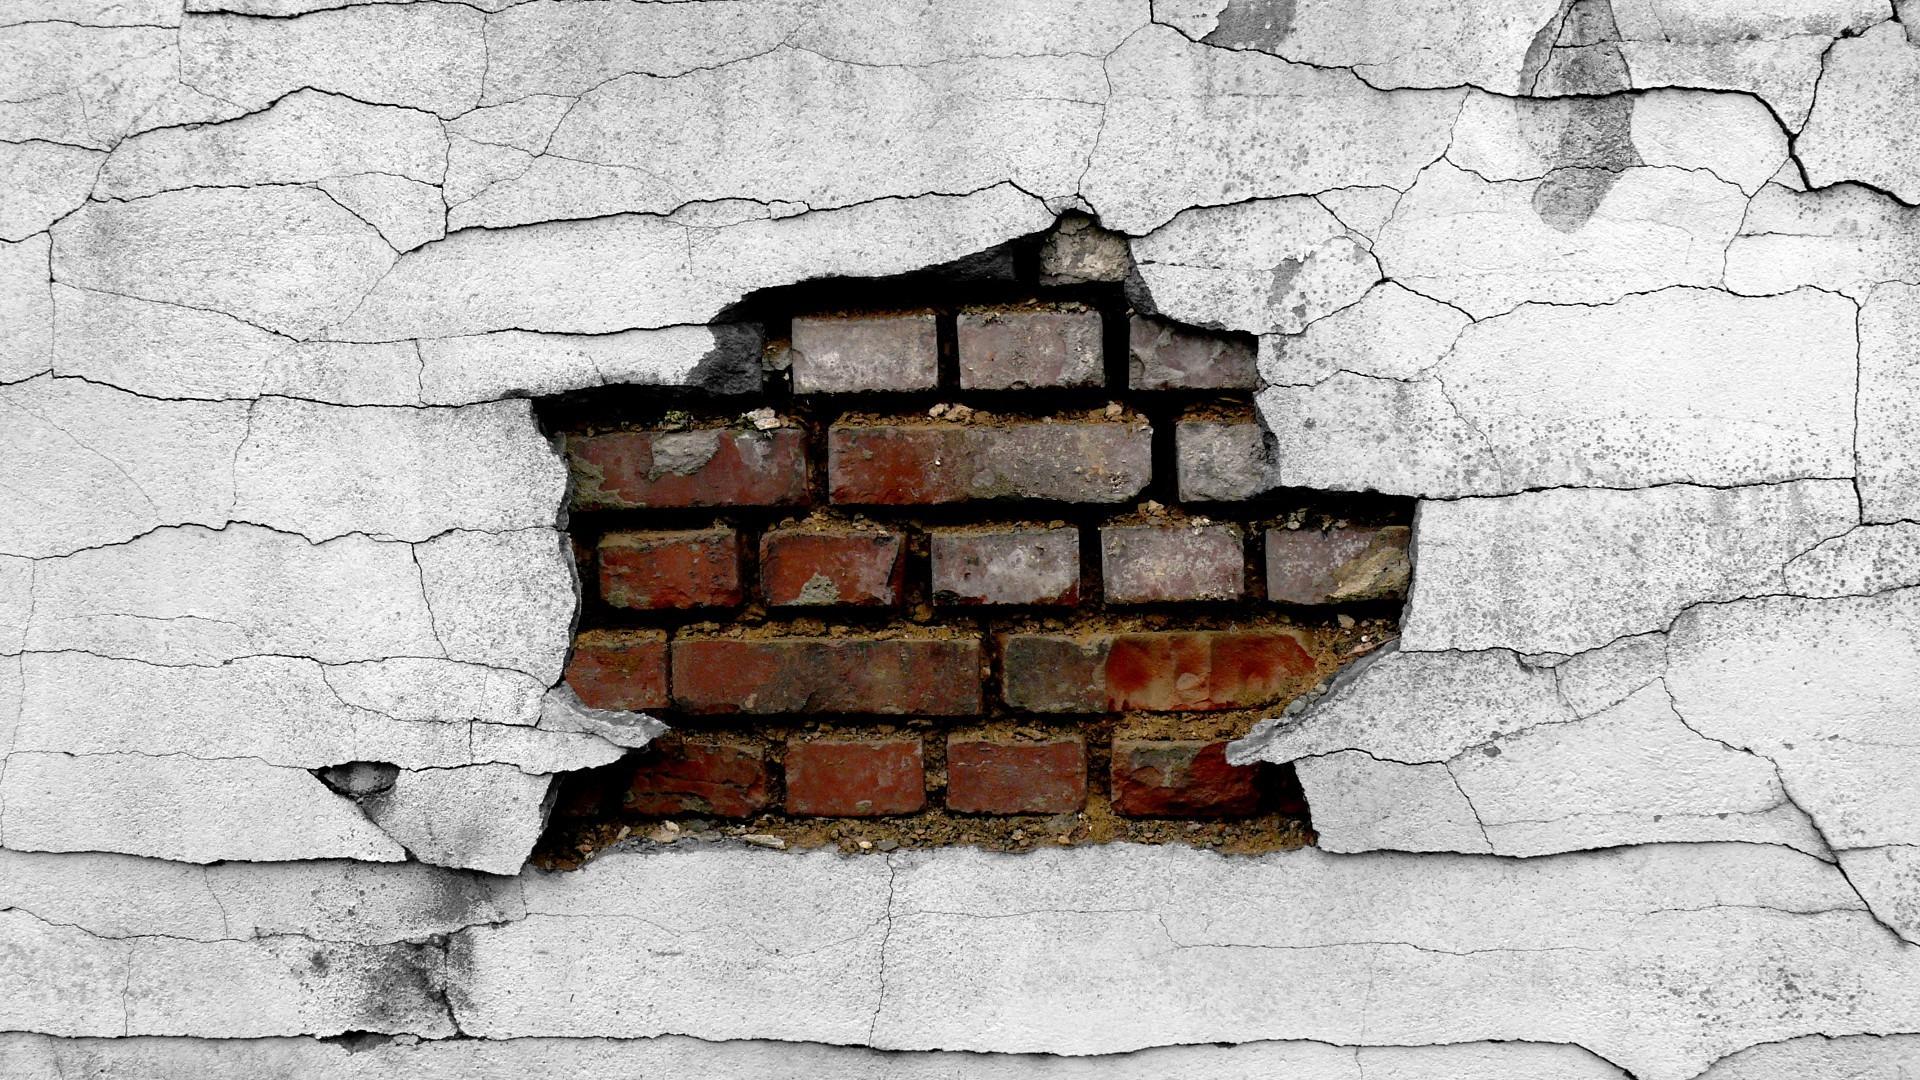 Black Hole Wallpaper Android Wallpaper Window Rock Bricks Wood Texture Broken